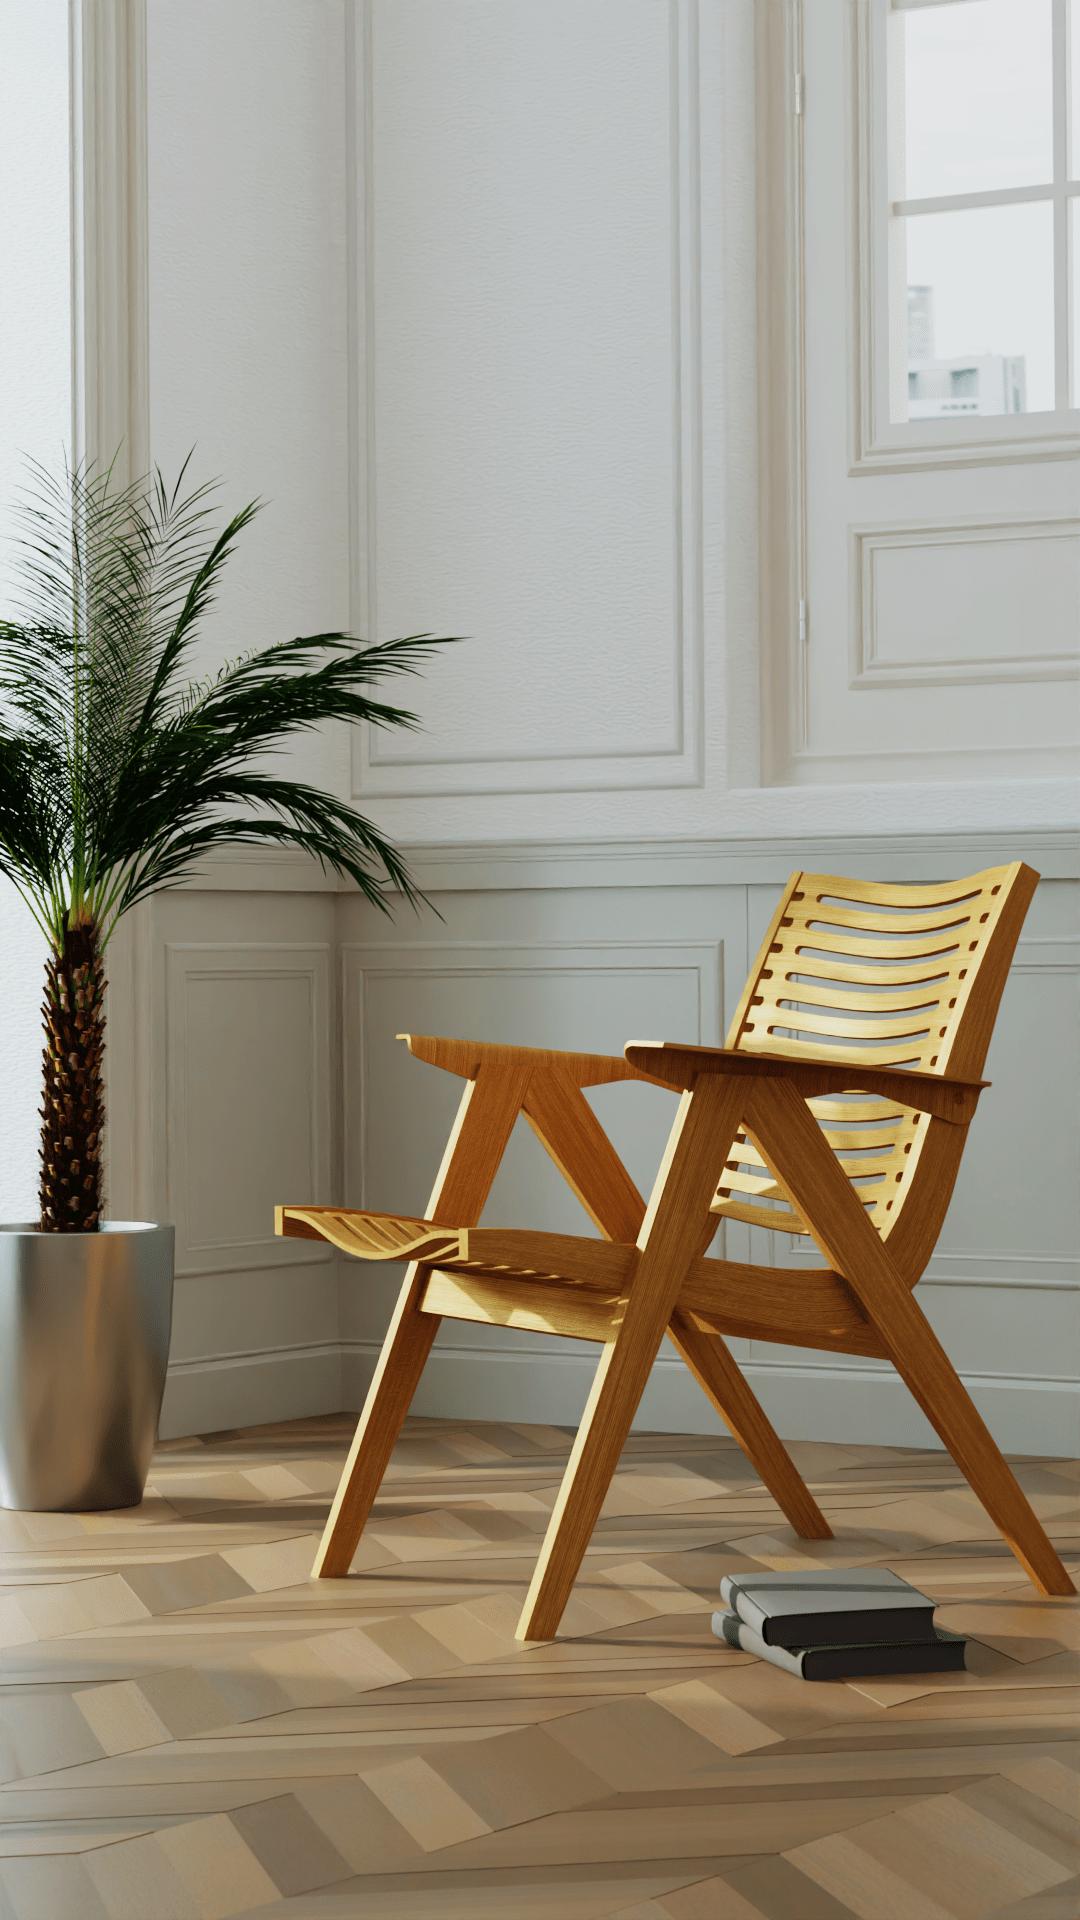 3D art CGI chiar Collection design furniture Interior lighting